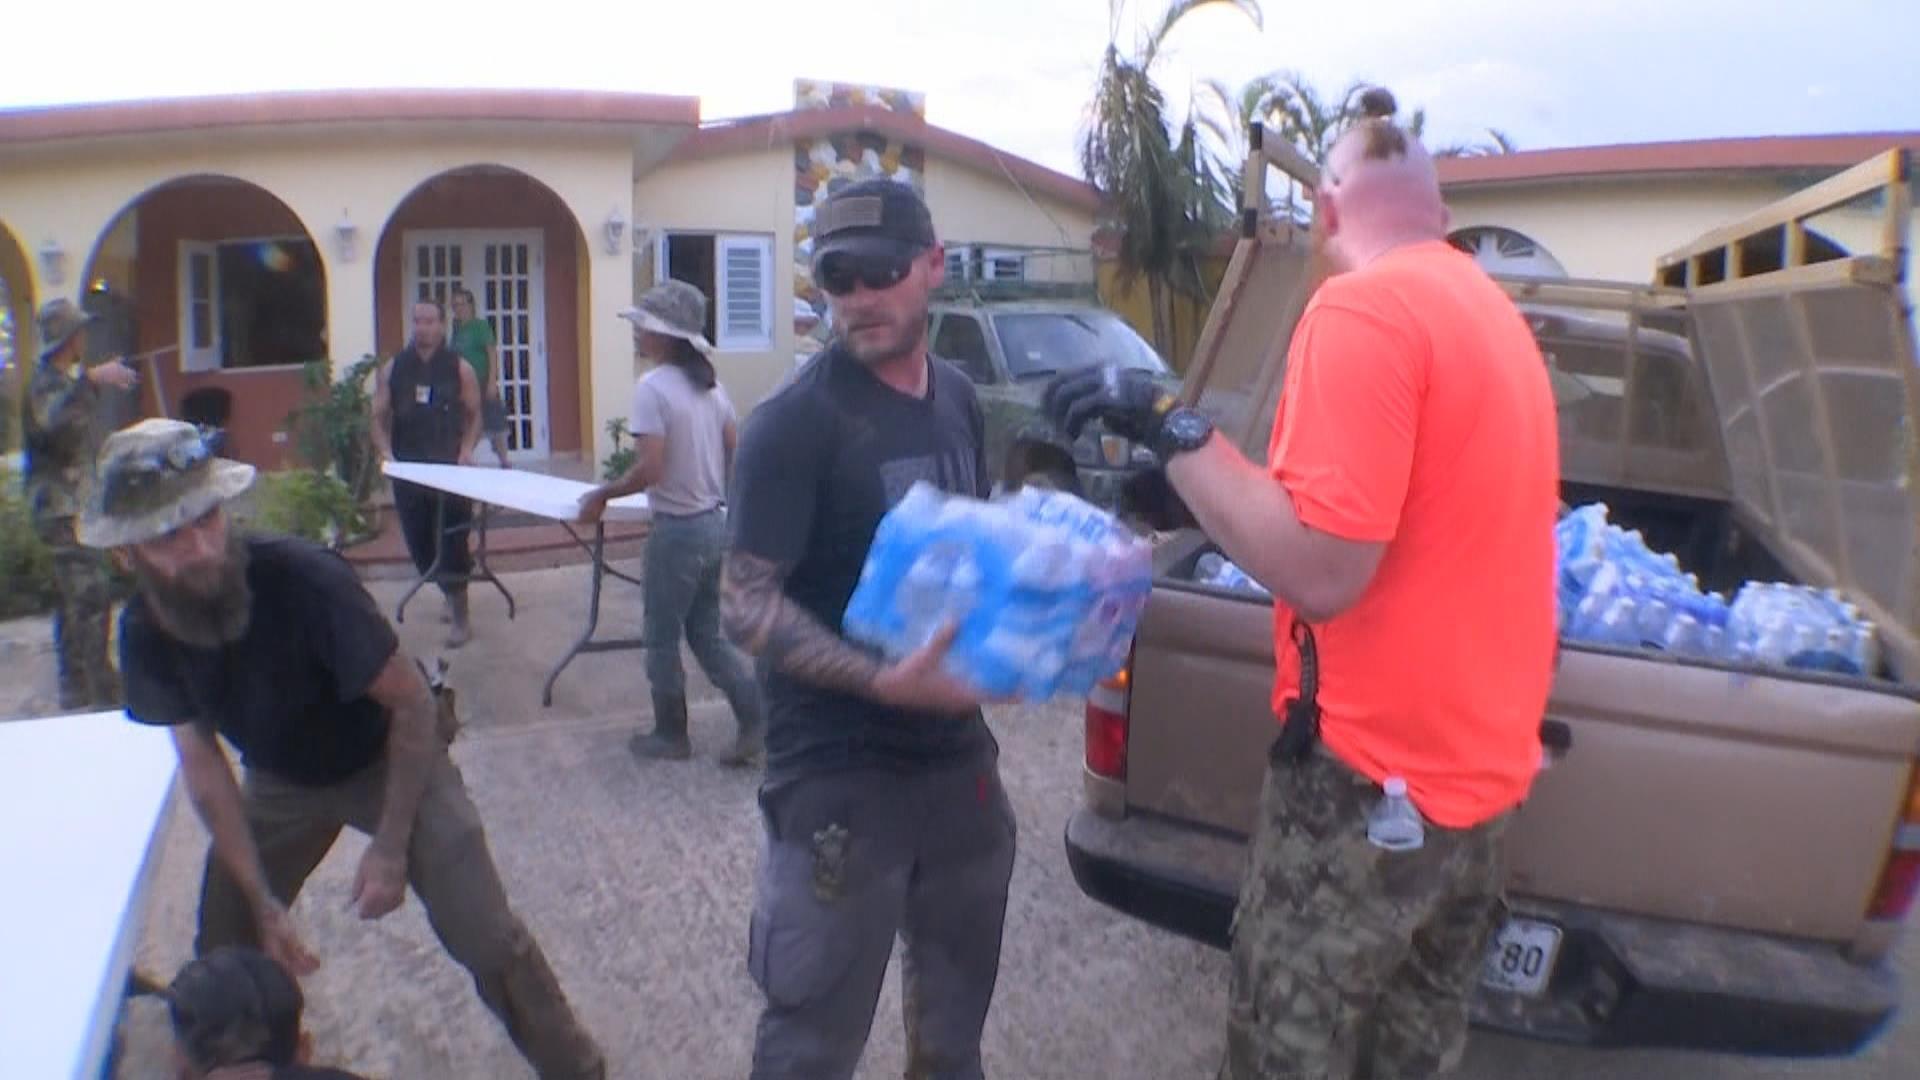 The veterans saving lives in Puerto Rico